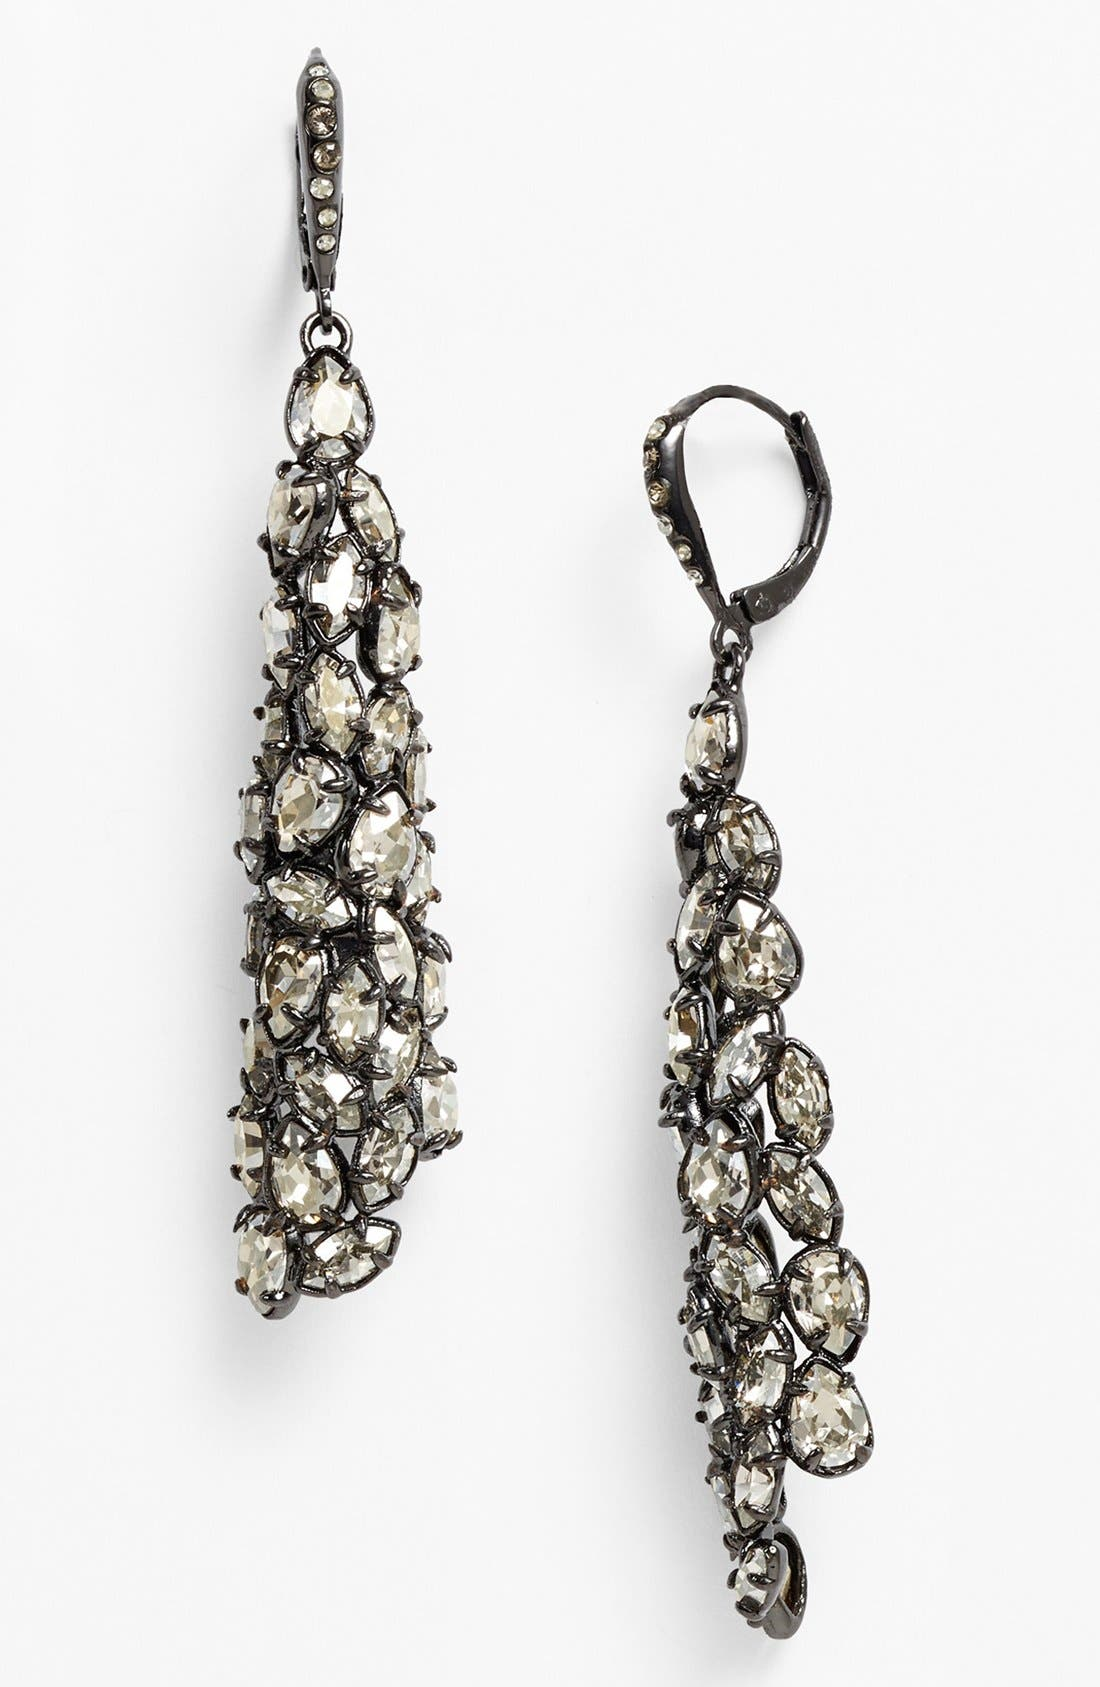 Alternate Image 1 Selected - Alexis Bittar 'Miss Havisham - Pavo' Drop Earrings